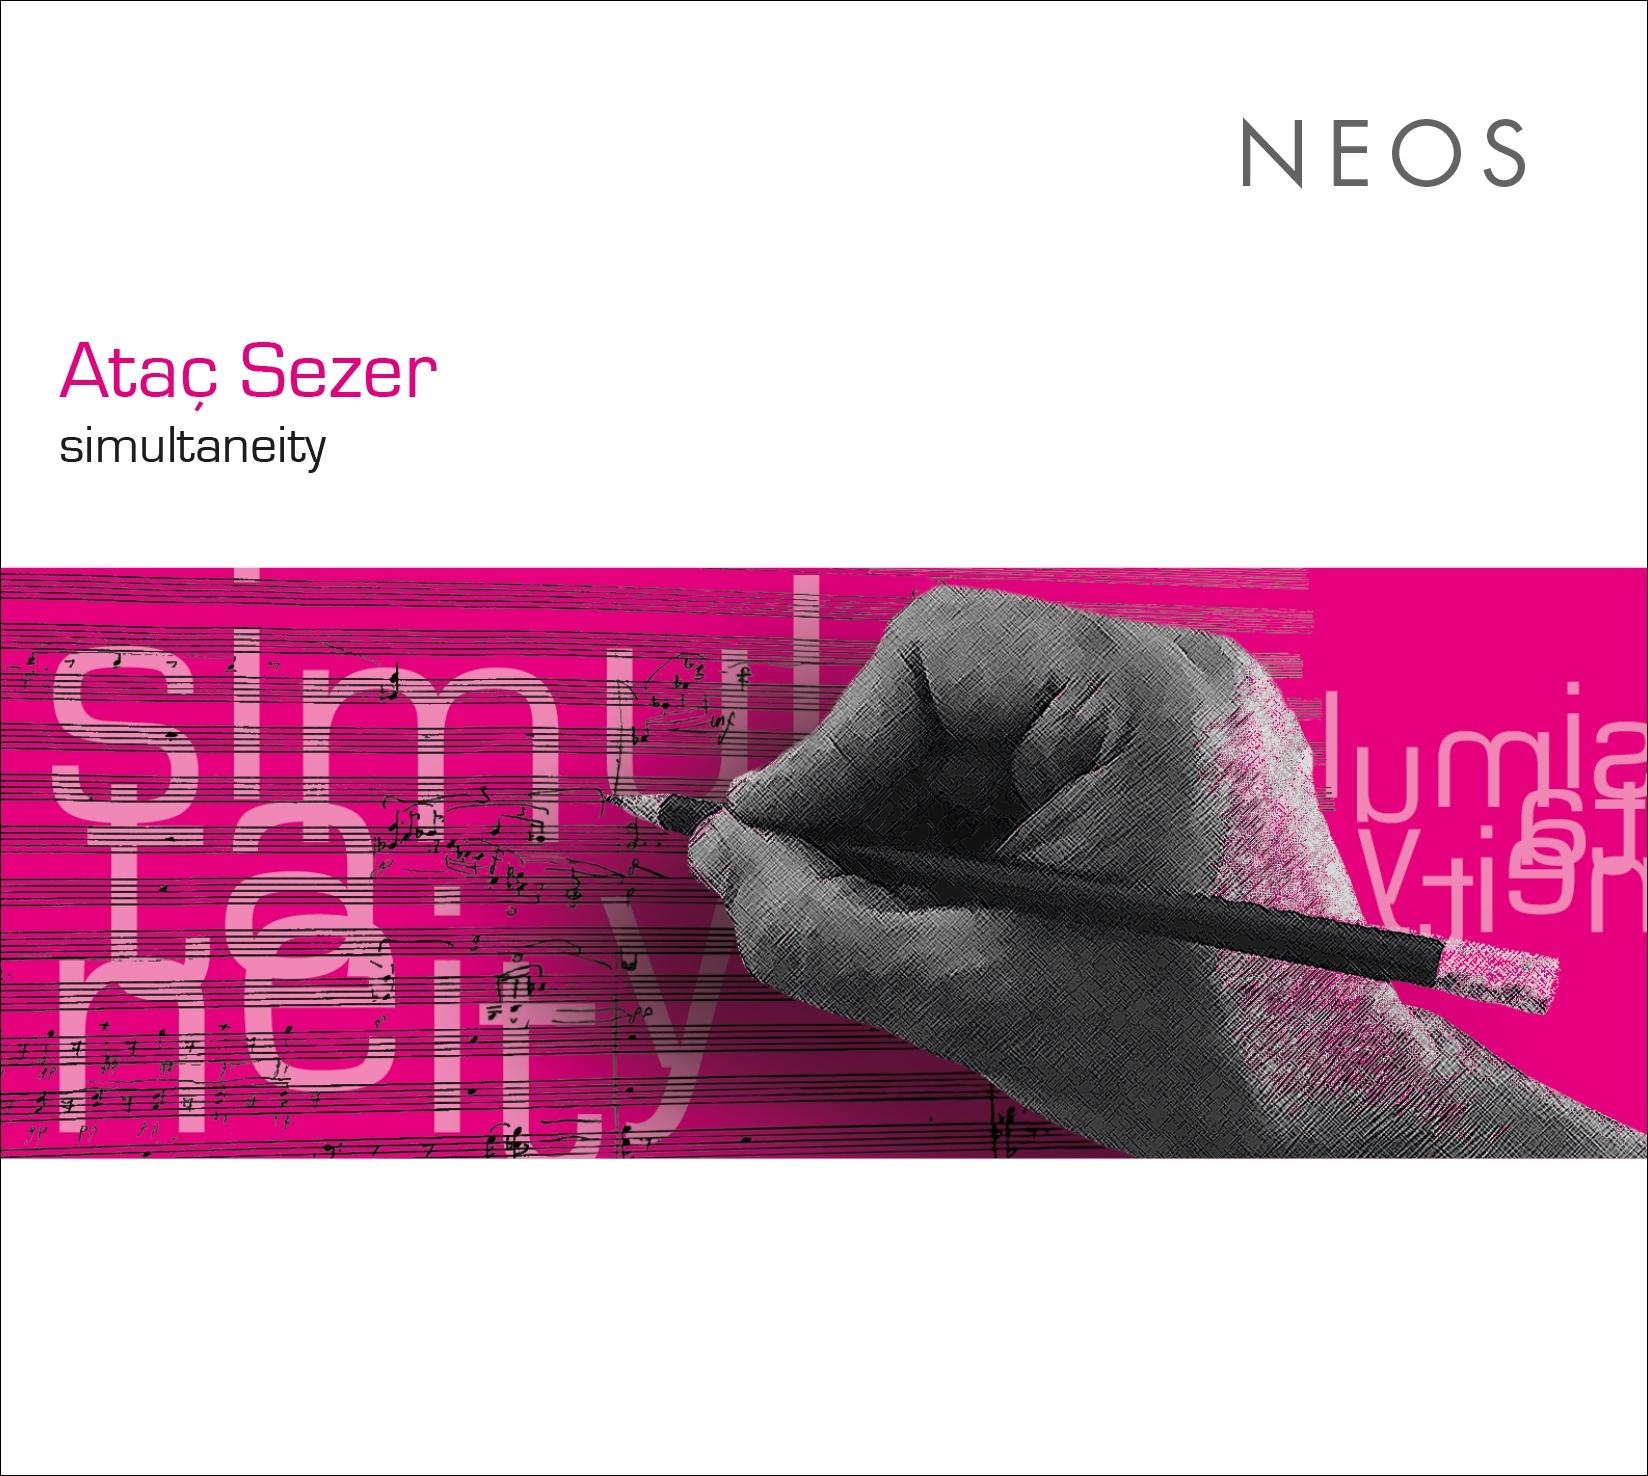 NEOS_11814_Sezer